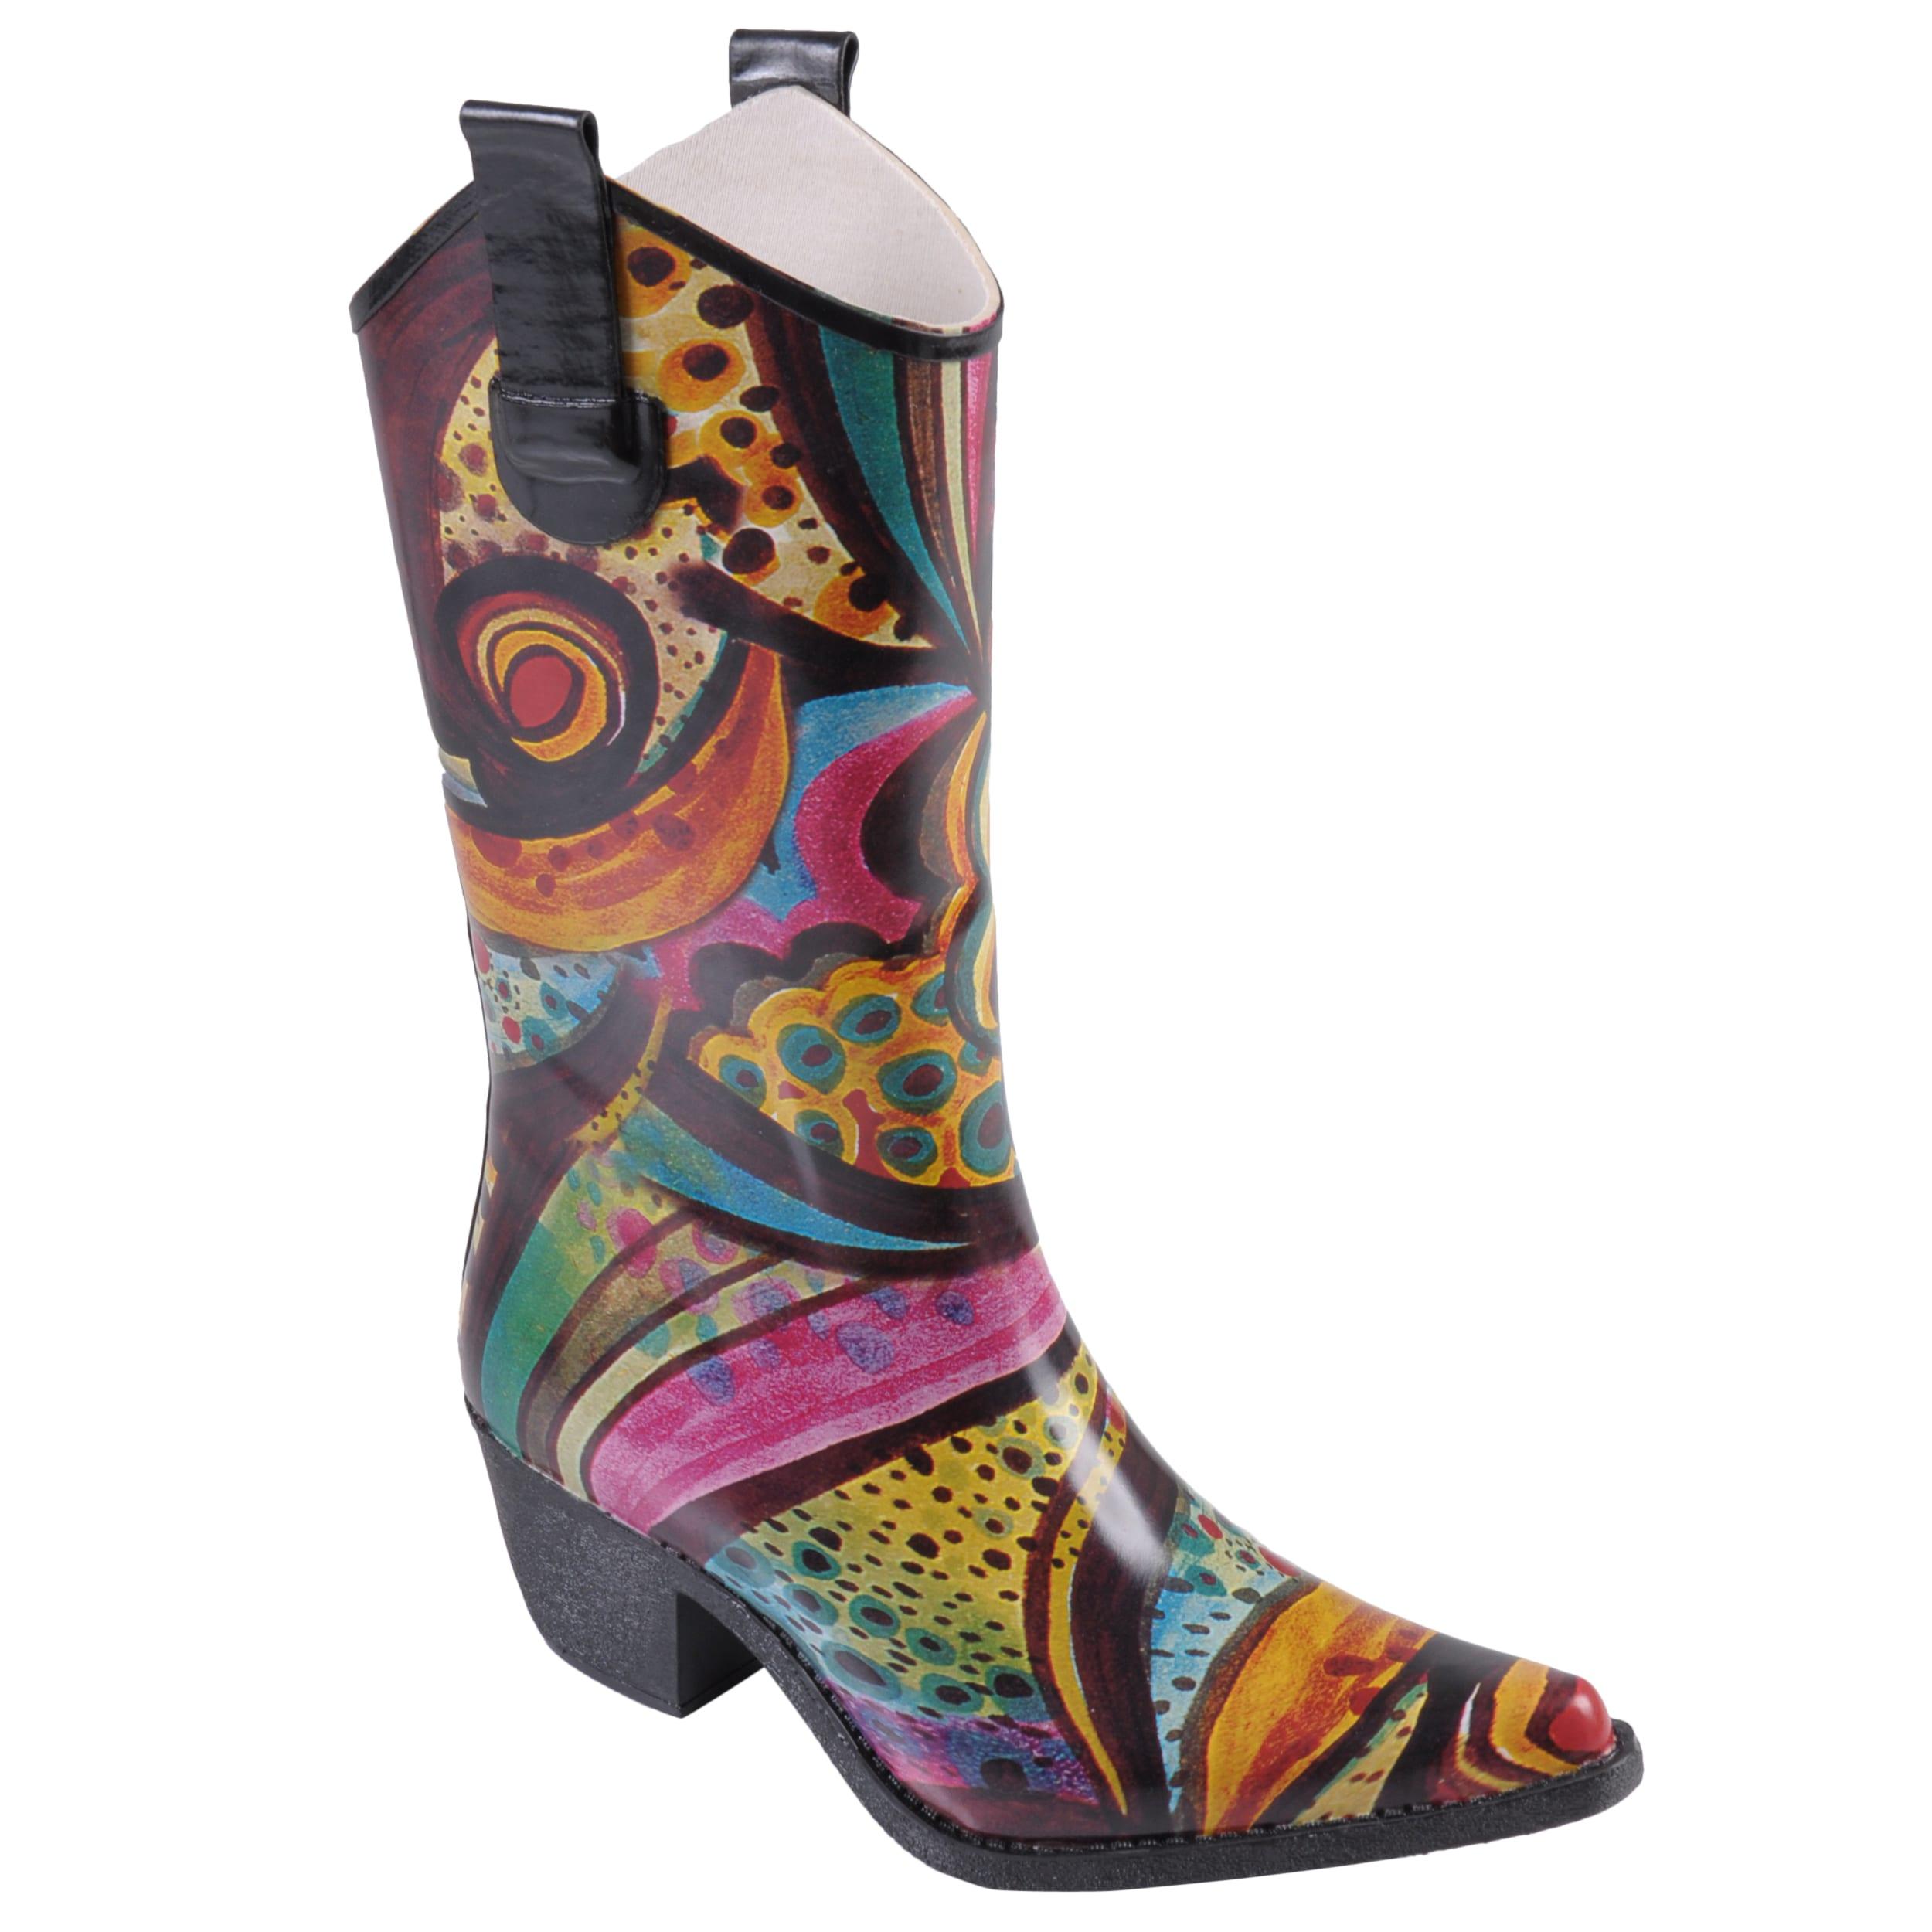 Journee Collection Women's Cowboy Style Fashion Rainboots